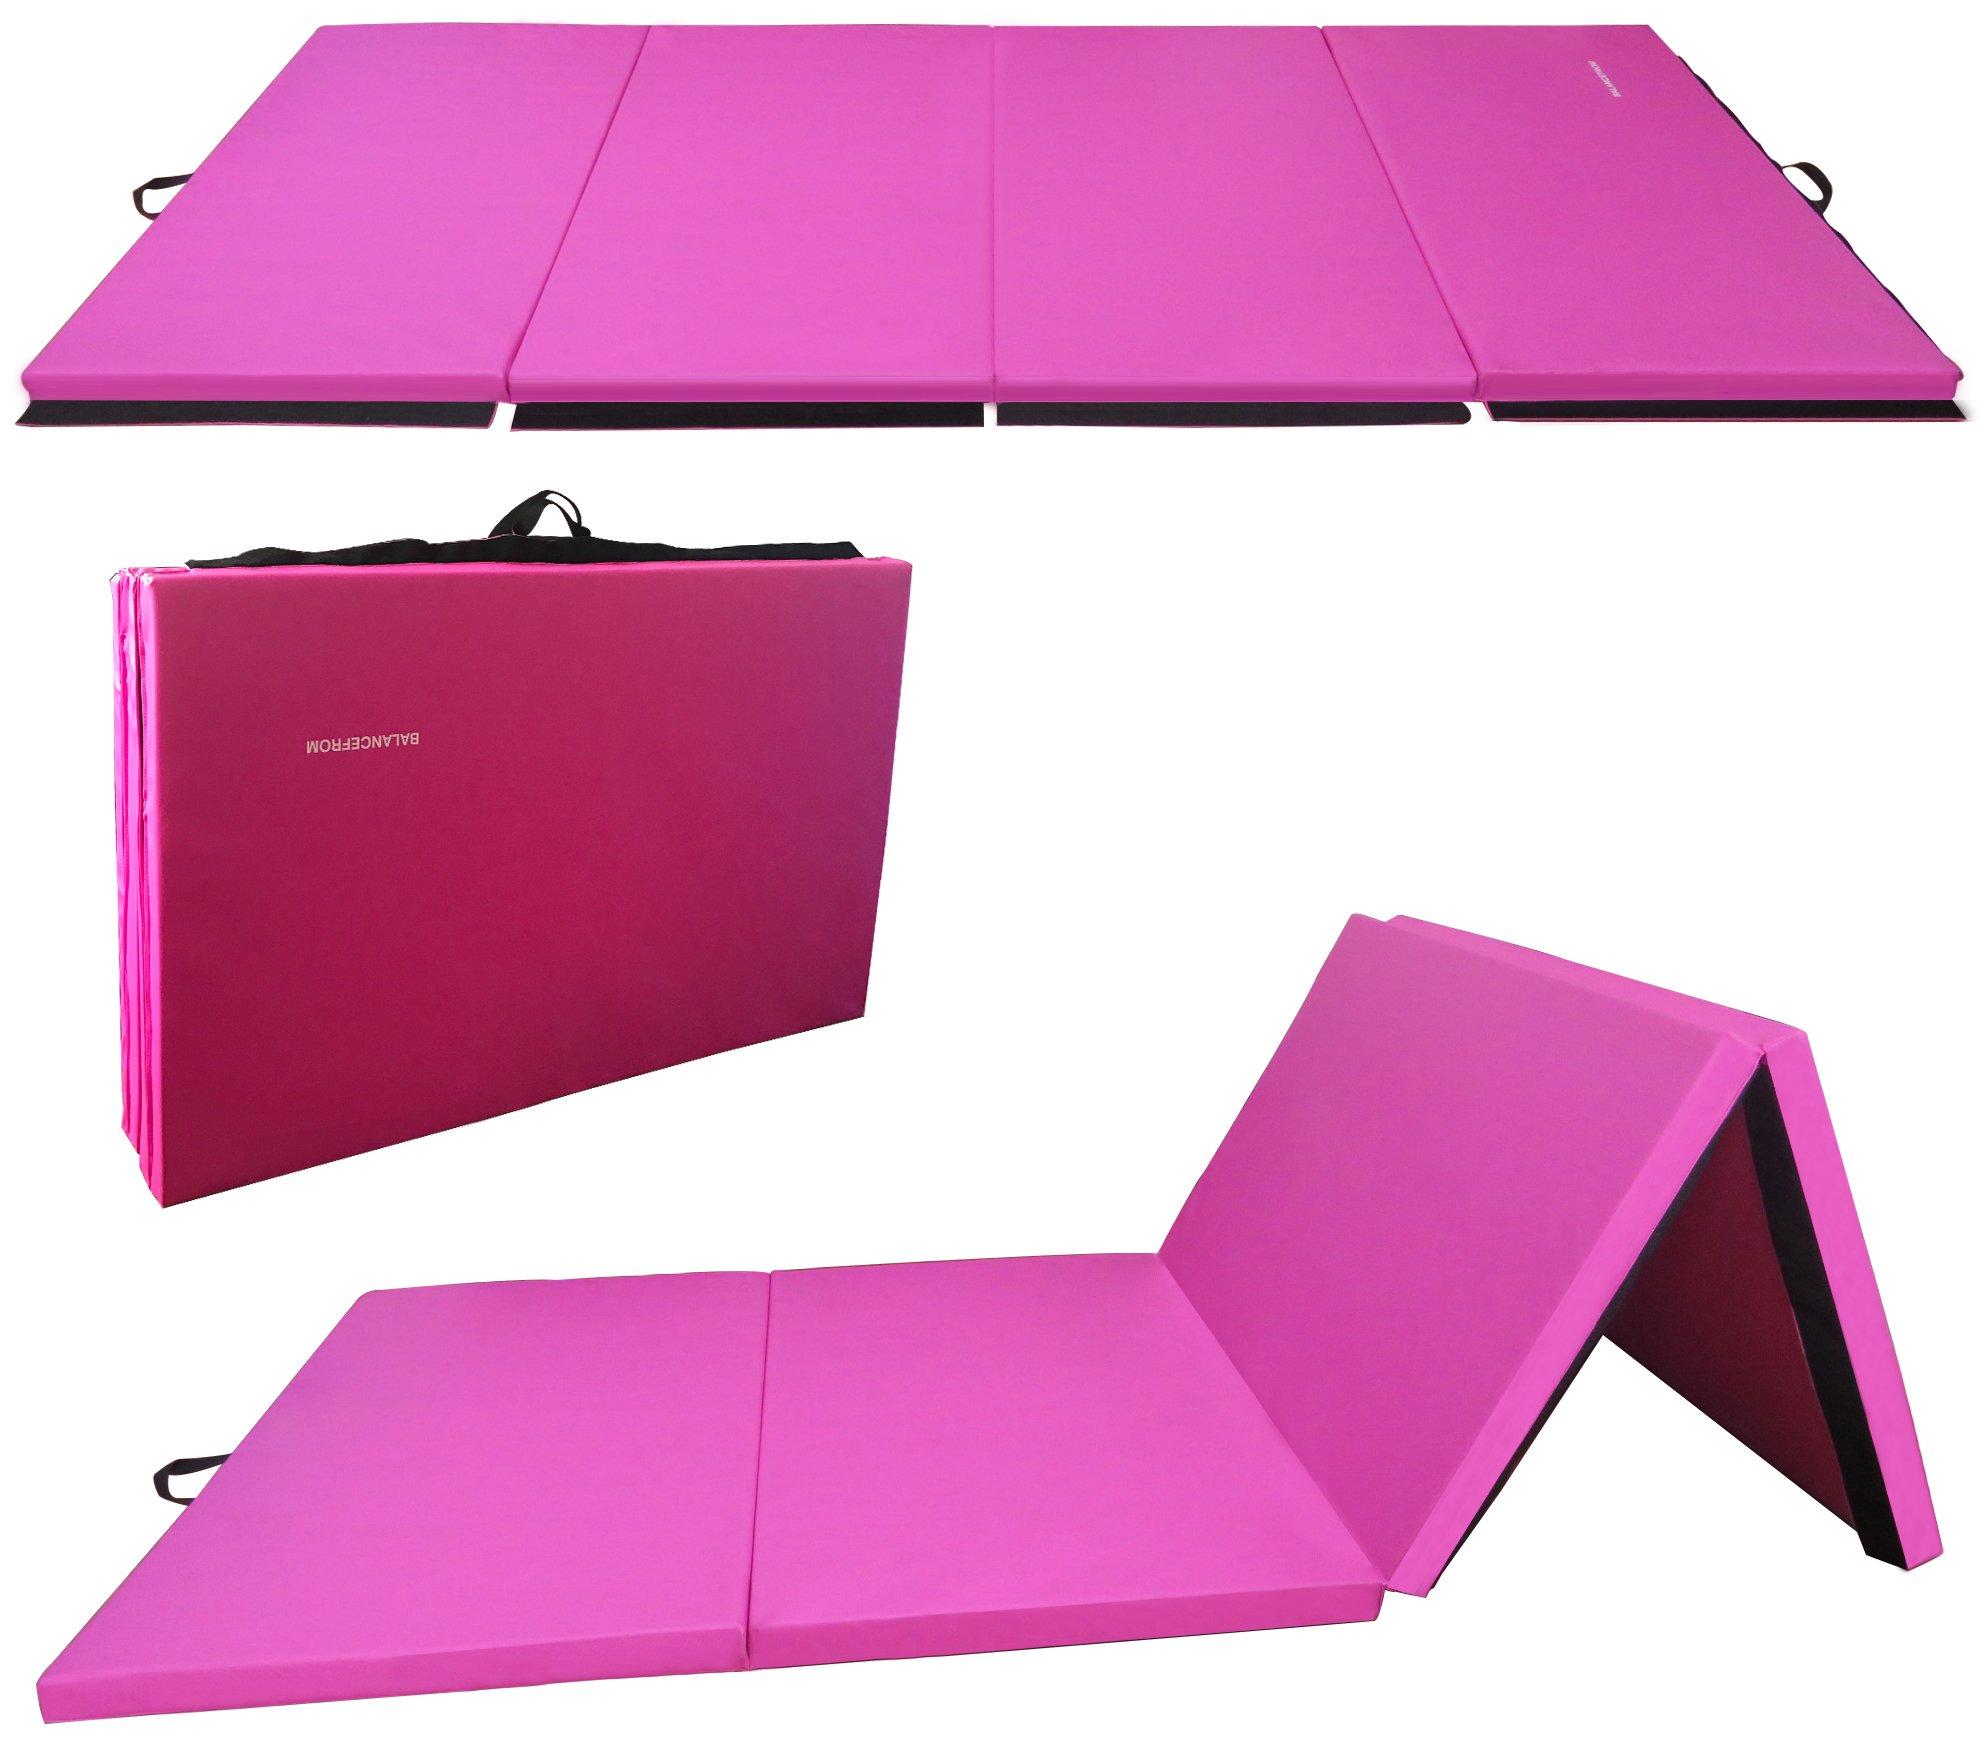 BalanceFrom BFGR-01PK All-Purpose Extra Thick High Density Anti-Tear Gymnastics Folding Exercise Aerobics Mats, 4' x 10' x 2'' by BalanceFrom